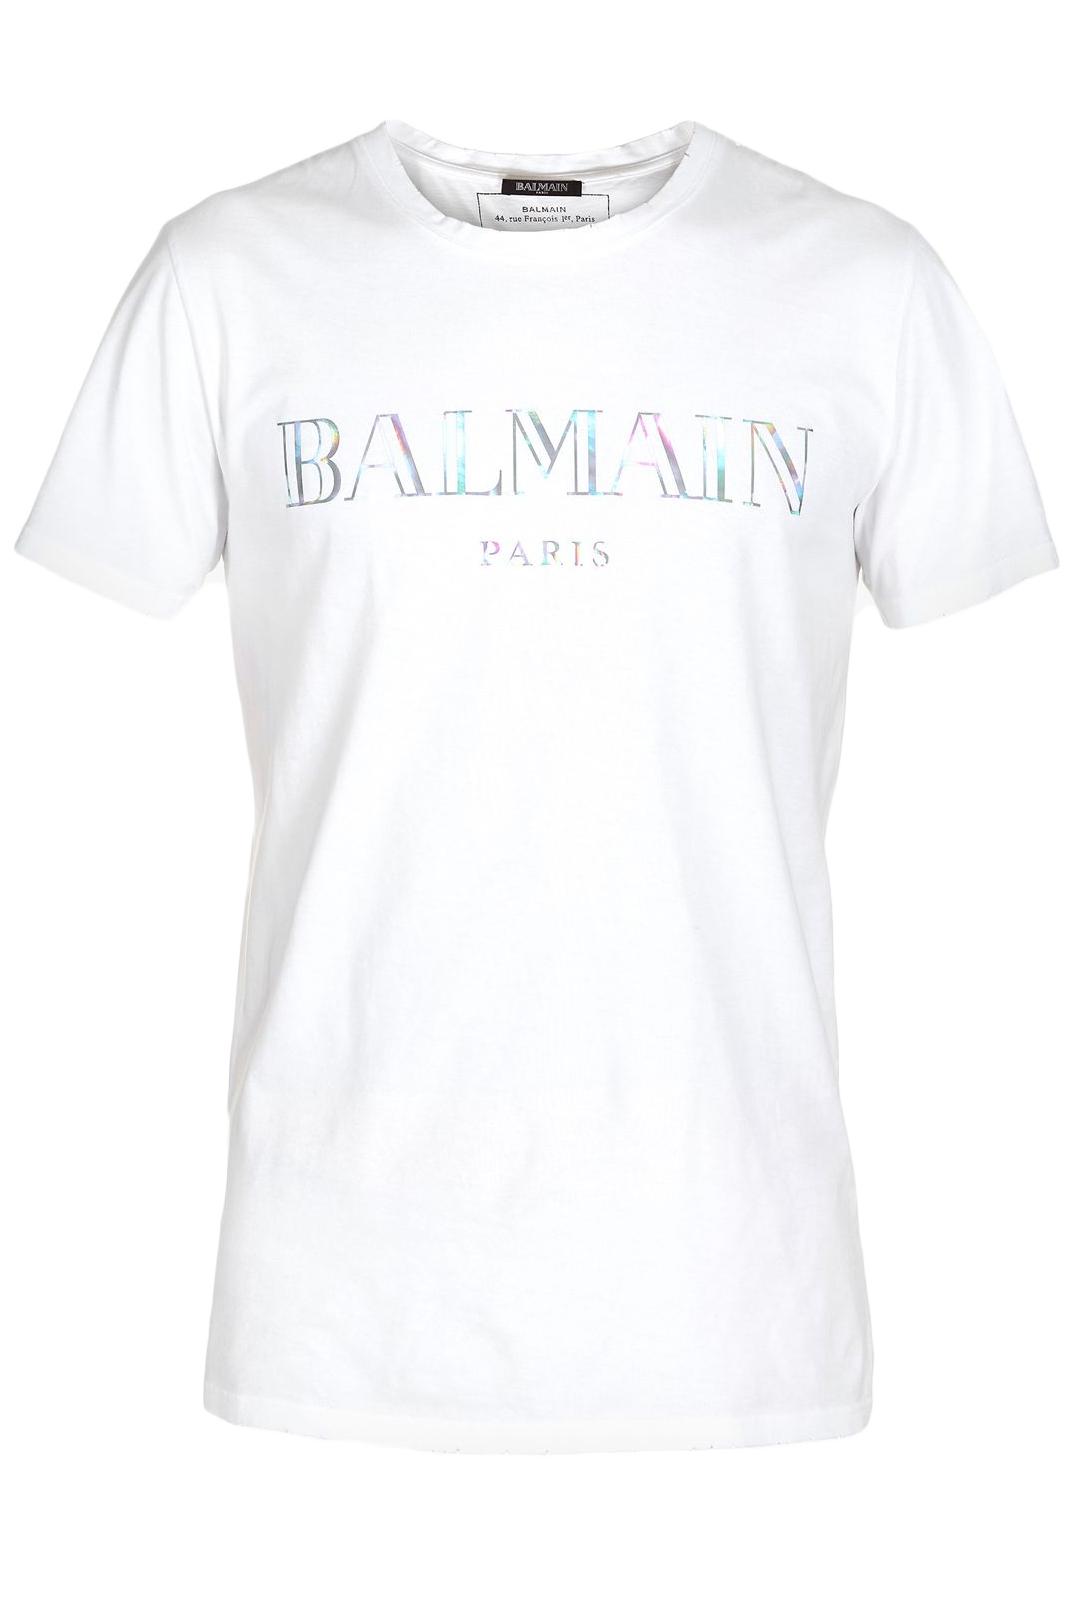 Tee-shirts  Balmain RH11601 WHITE/ARGENT